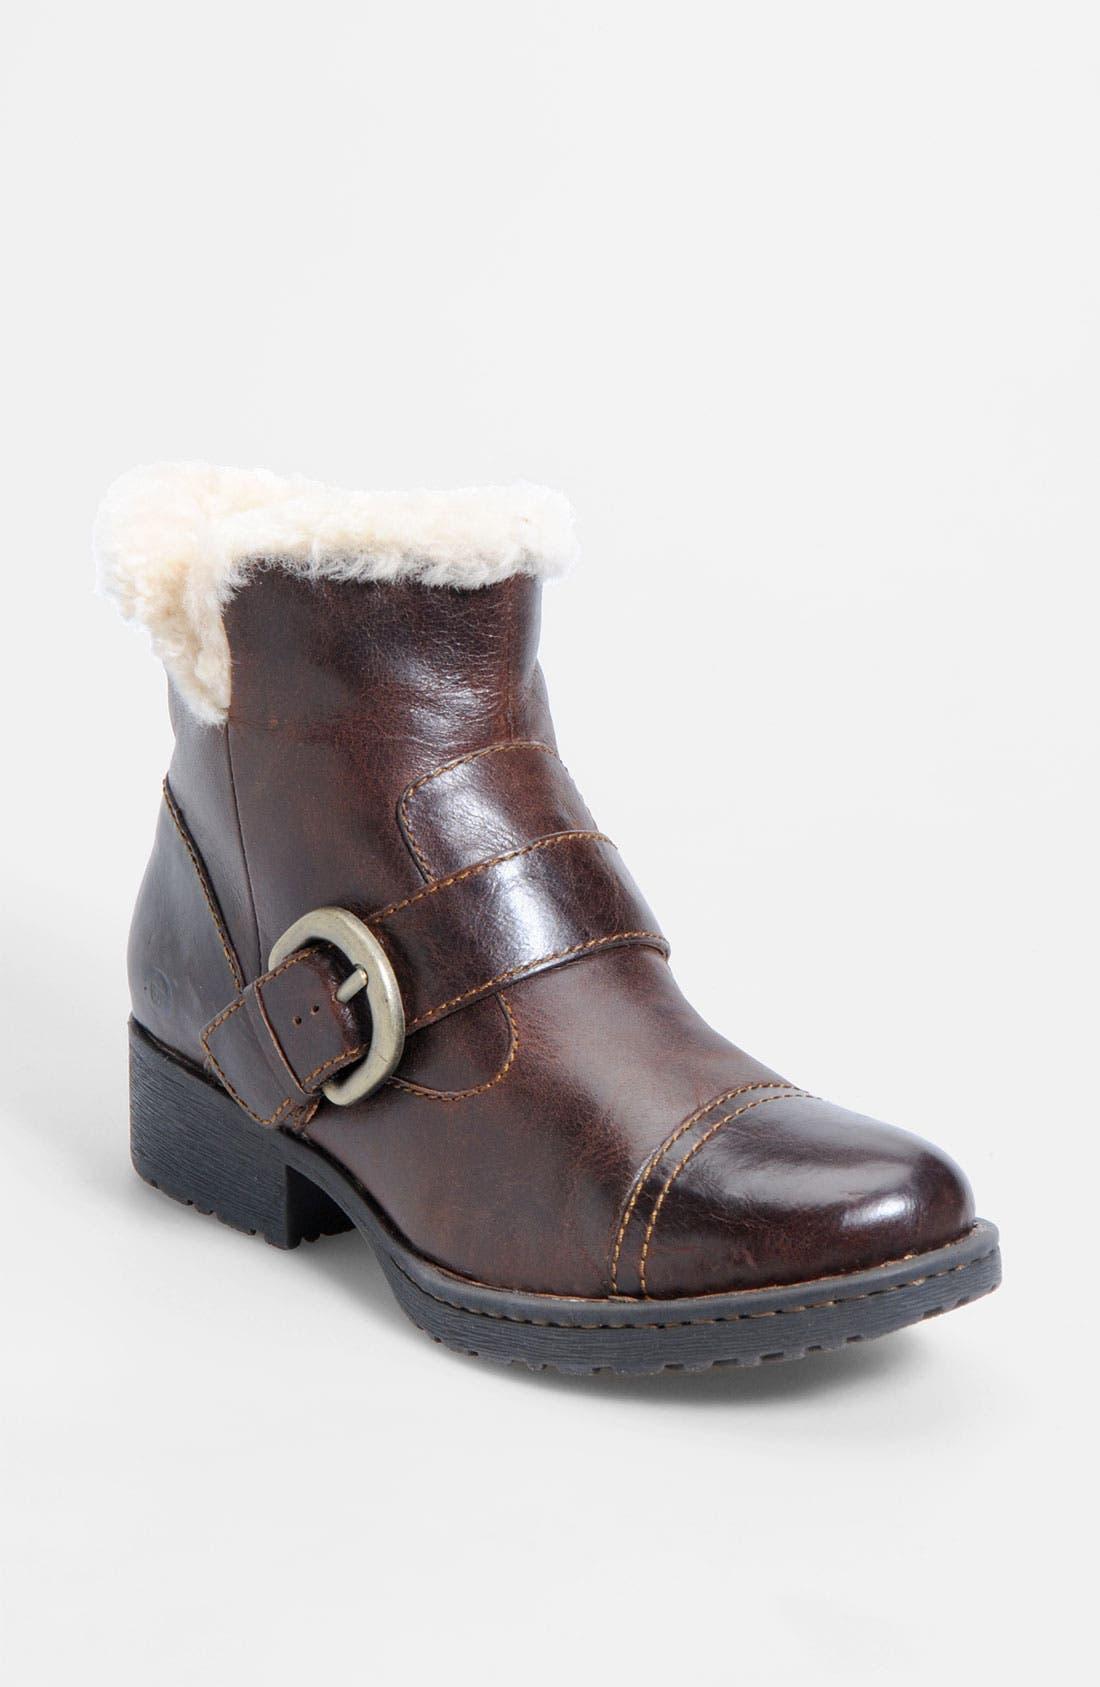 Alternate Image 1 Selected - Børn 'Ilia' Boot